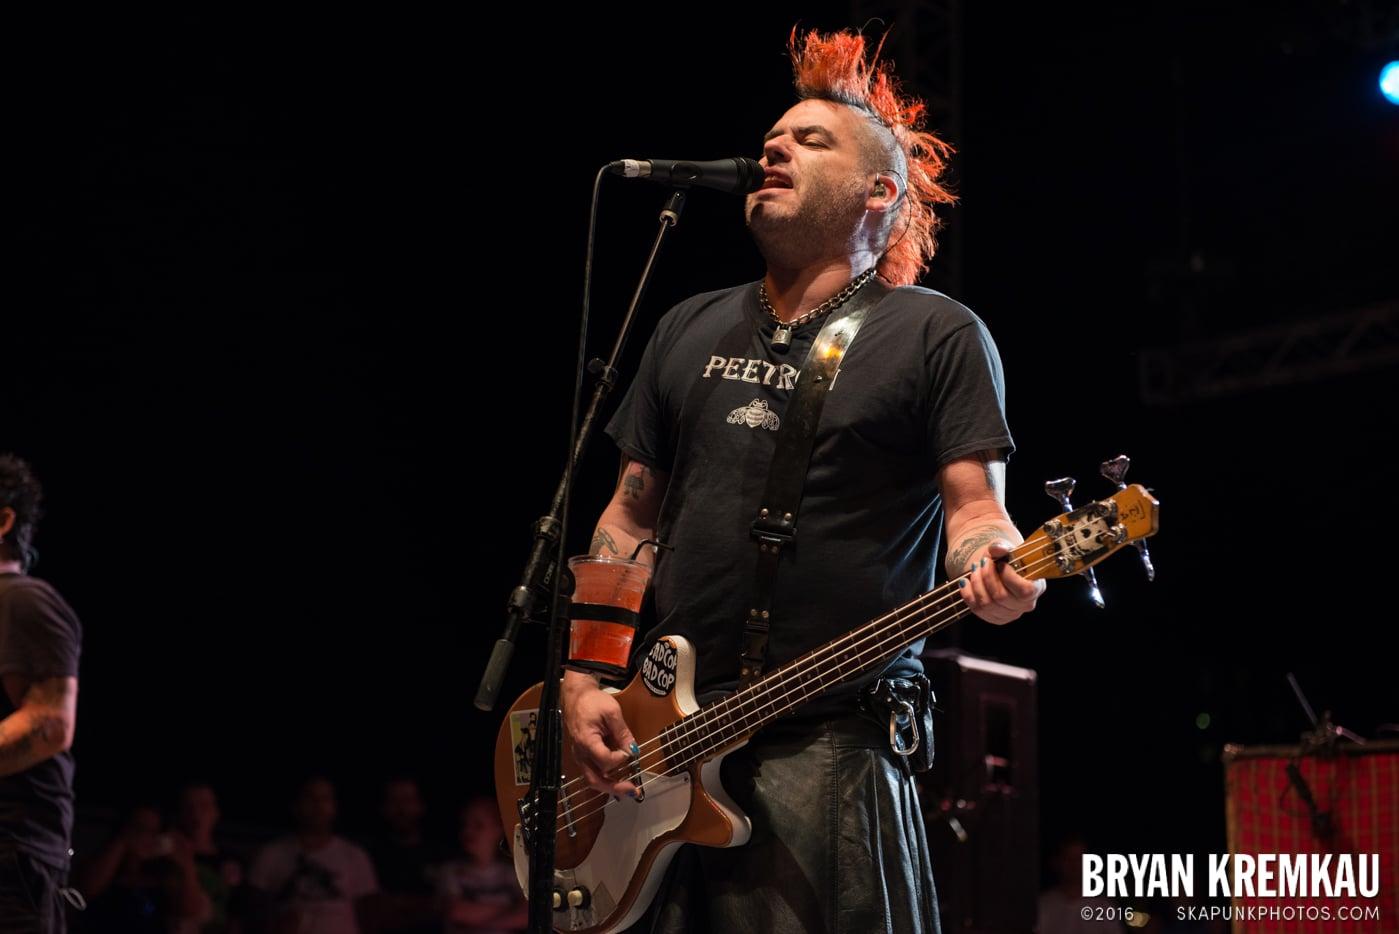 NOFX @ Stone Pony Summer Stage, Asbury Park, NJ - 8.15.15 (12)